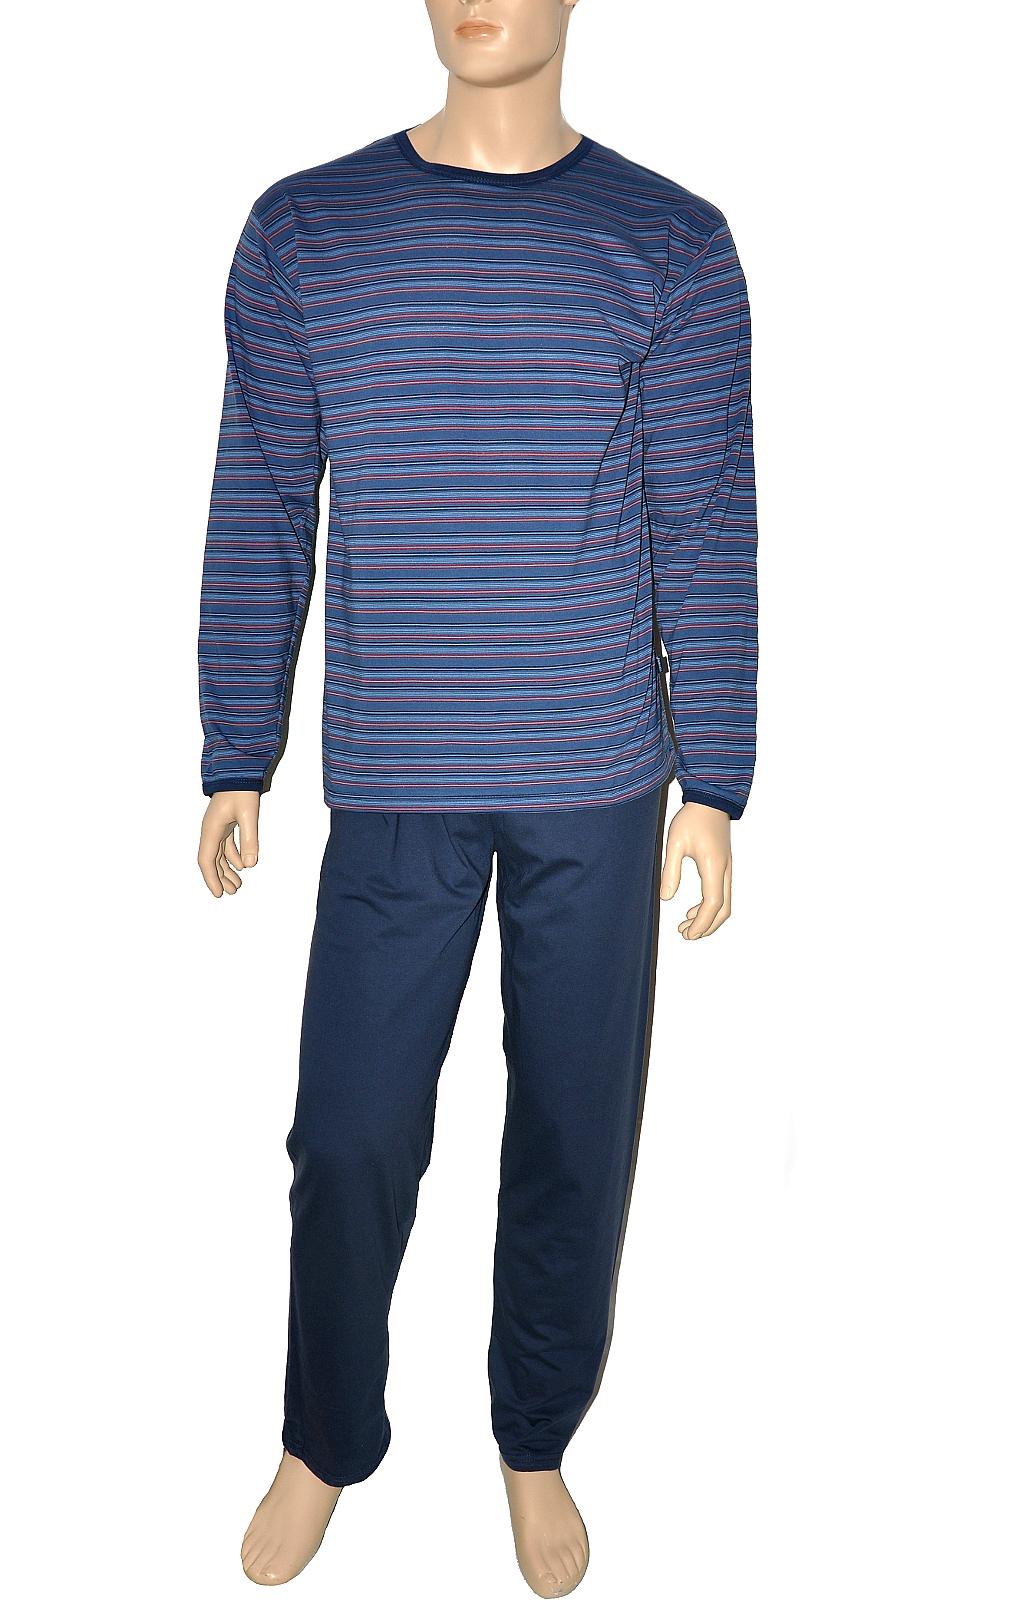 Pánské pyžamo Cornette 138/19 dl/r - Jeans/XXL